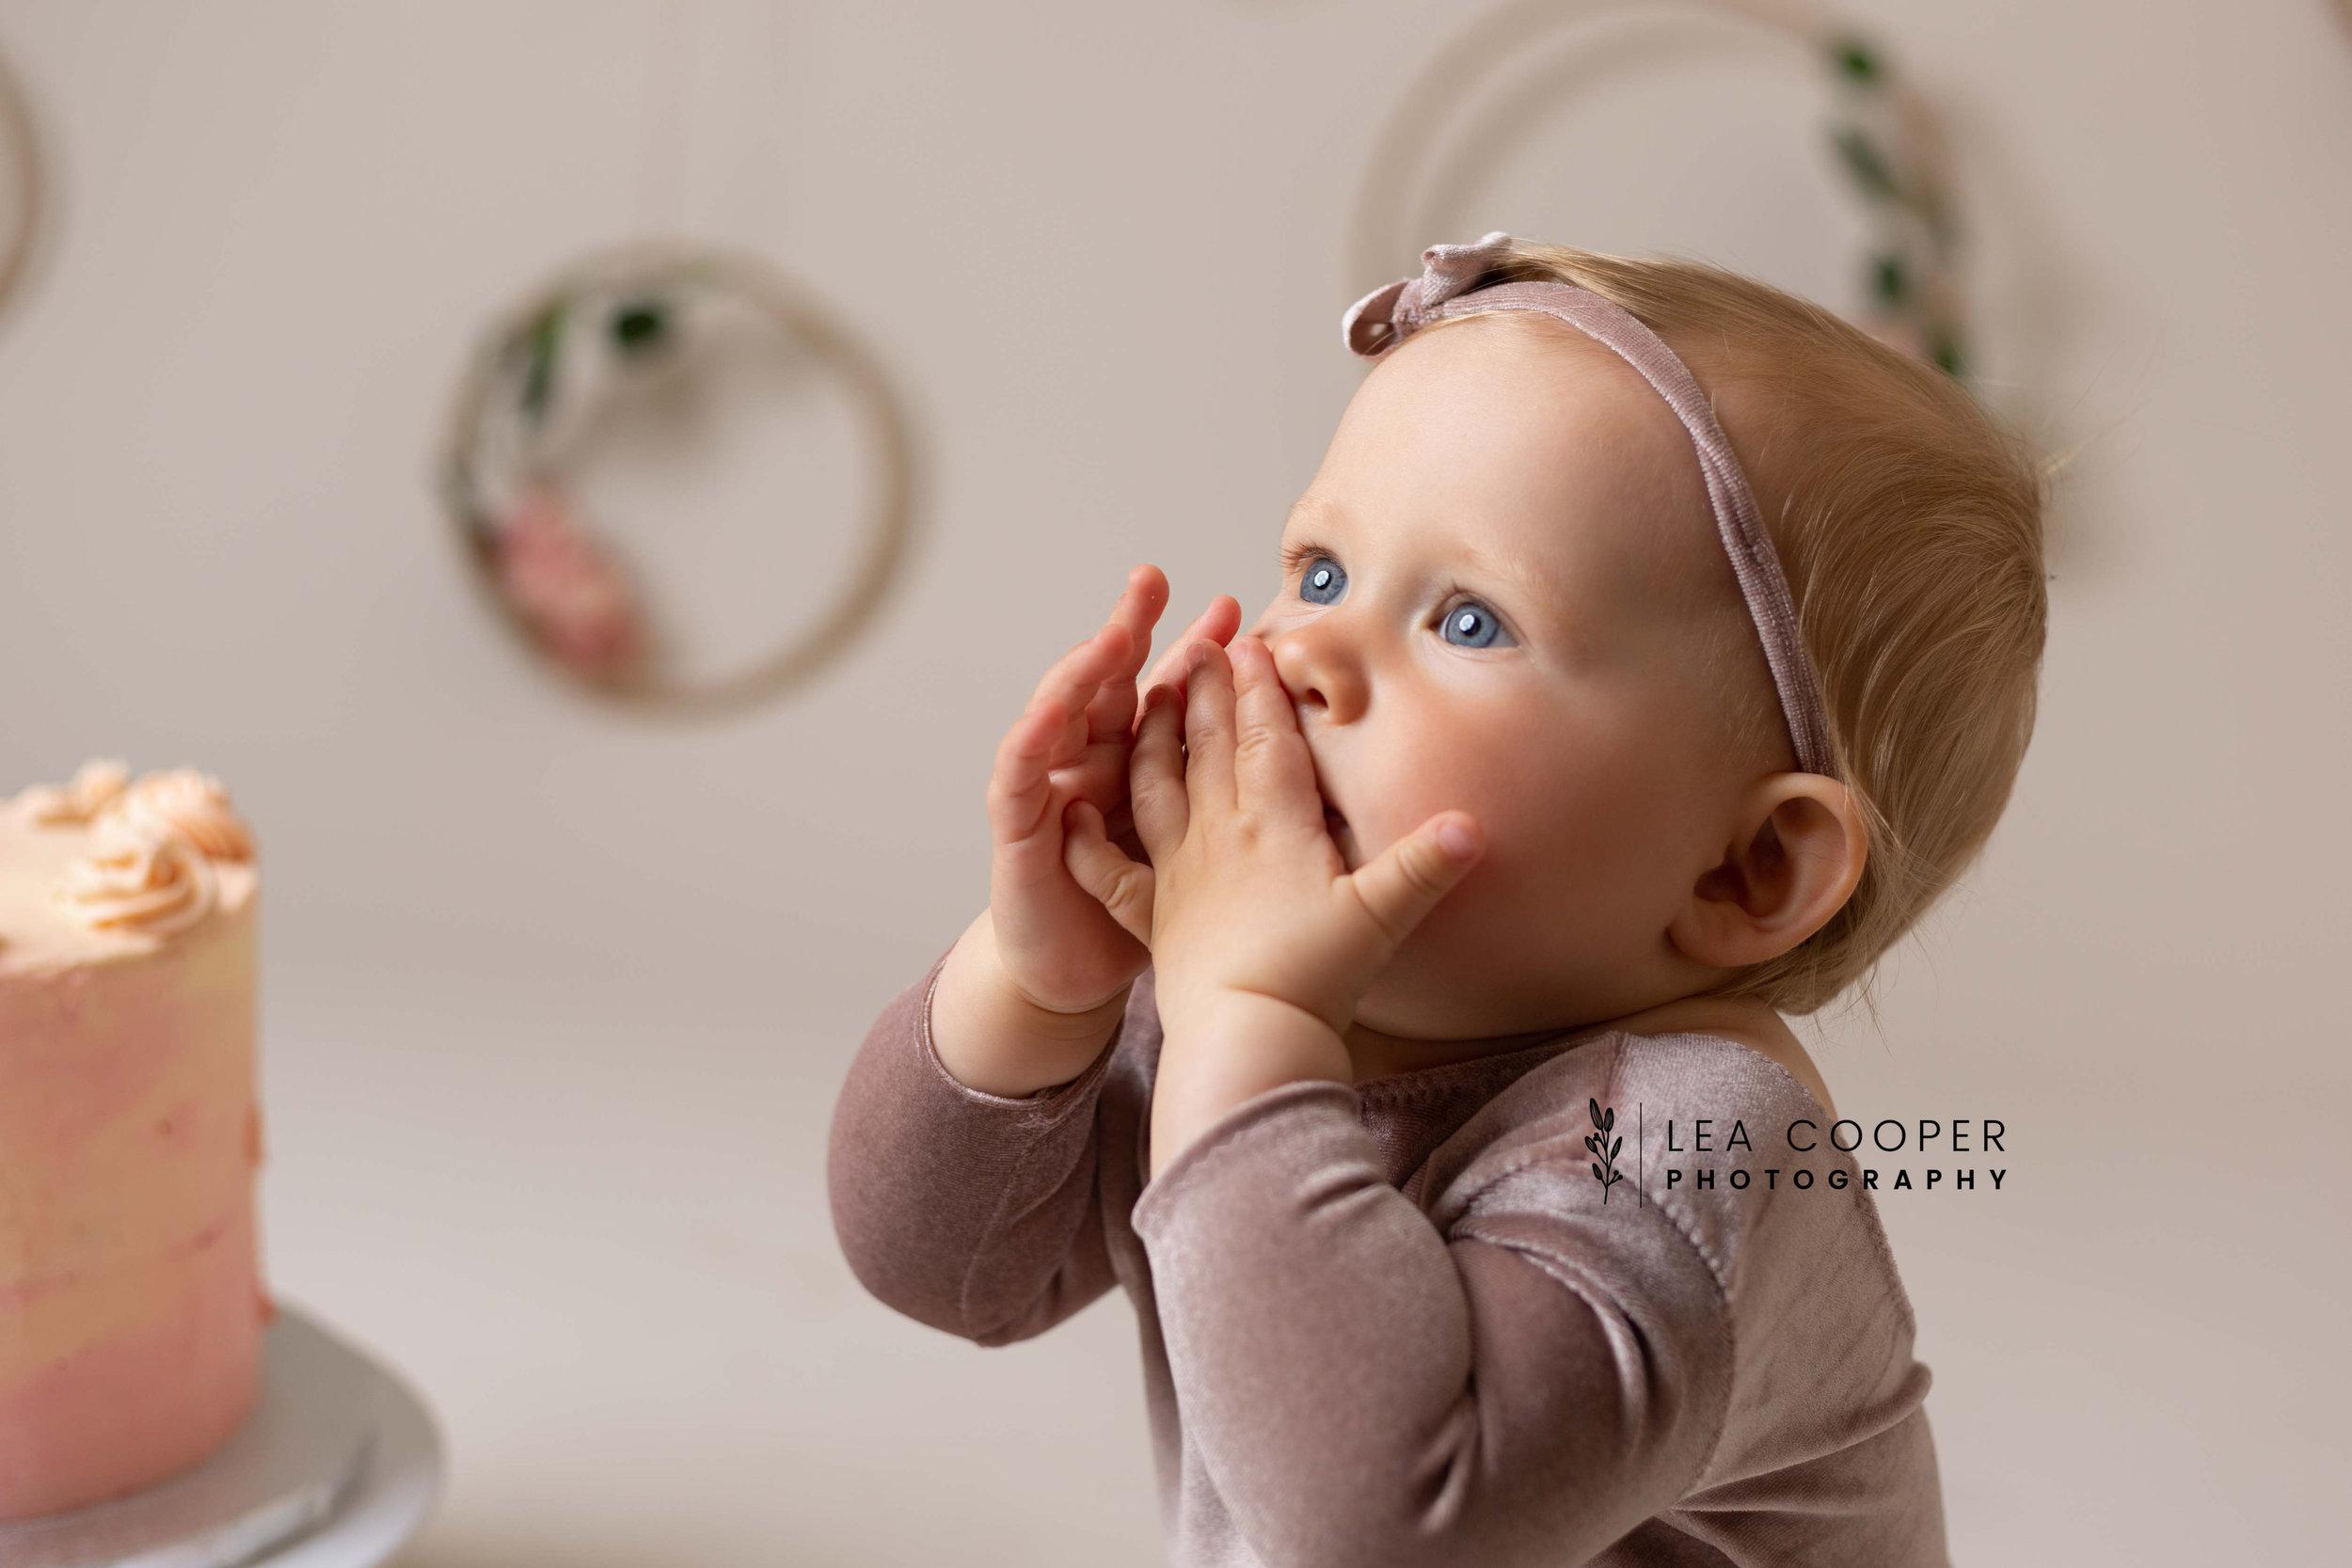 LEA-COOPER-PHOTOGRAPHY-CAKE-SMASH-PHOTOS-BIRTHDAY-PICTURES-WILLENHALL-WEST-MIDLANDS-SPLASH-CHILD-PHOTOGRAPHY-PORTRAIT-WEST-MIDLANDS-WOLVERHAMPTON-9.jpg